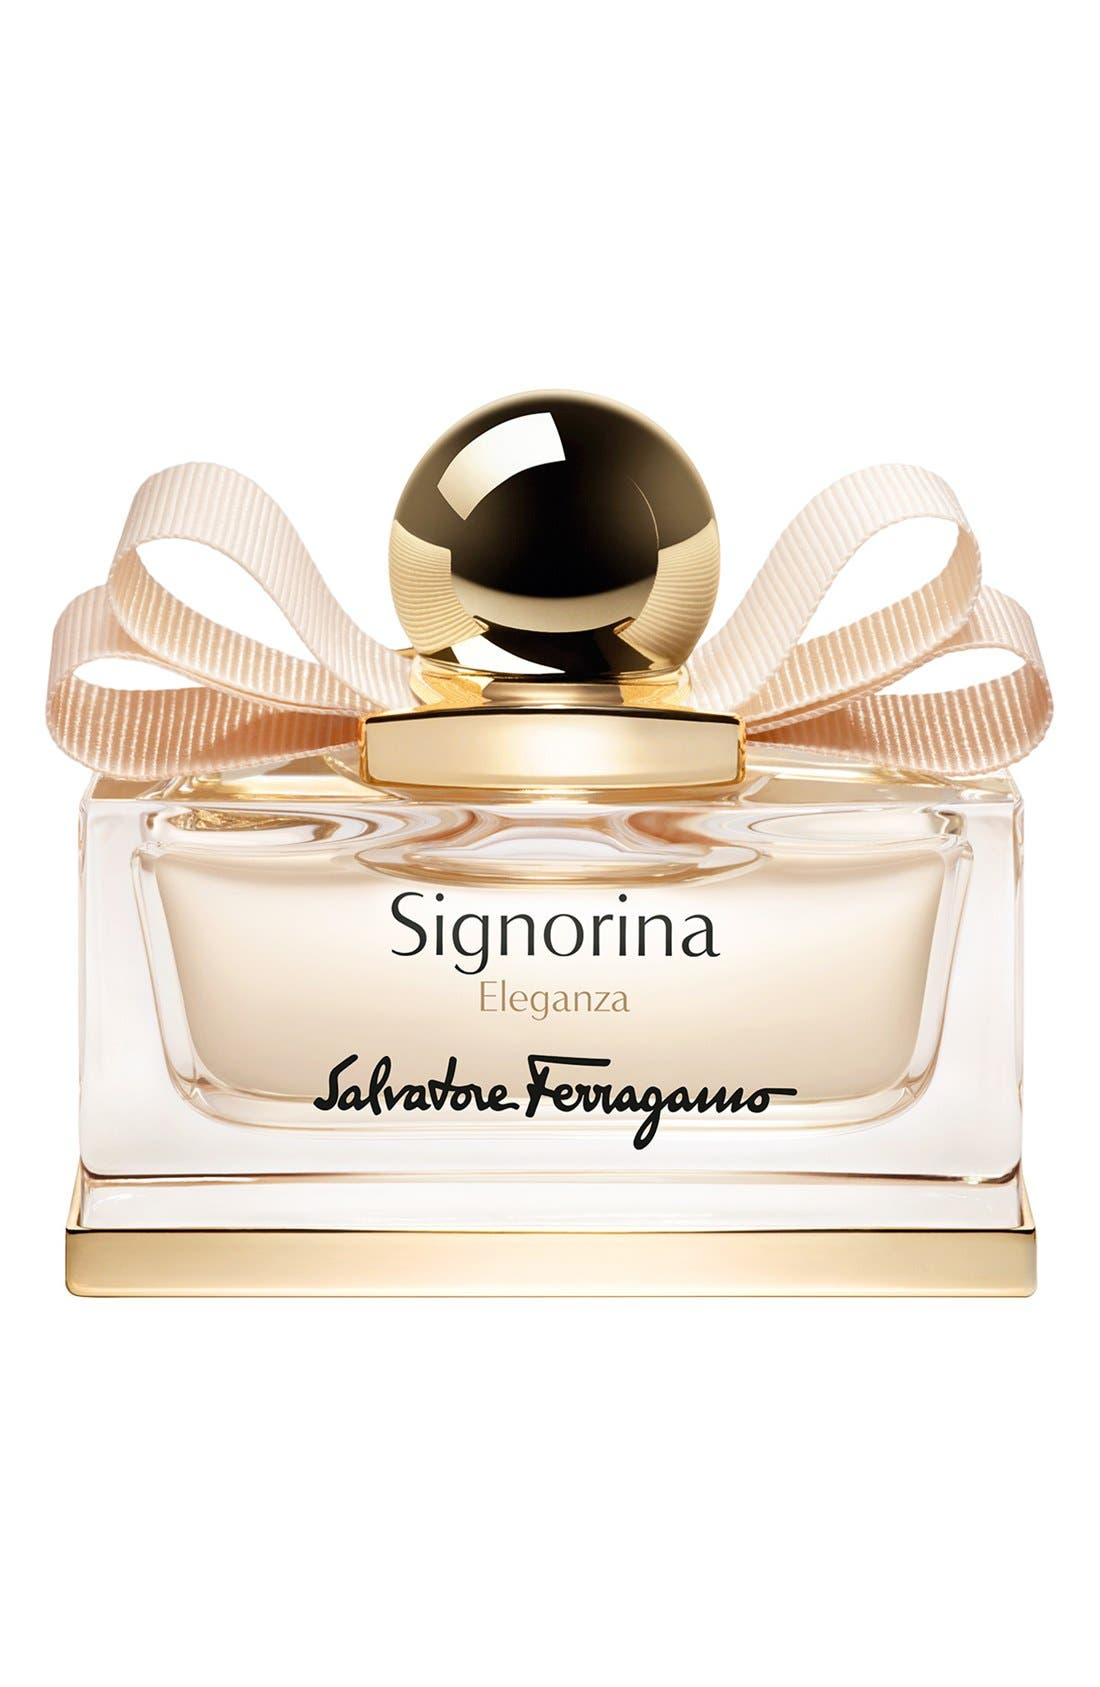 SALVATORE FERRAGAMO 'Signorina Eleganza' Eau de Parfum, Main, color, 000